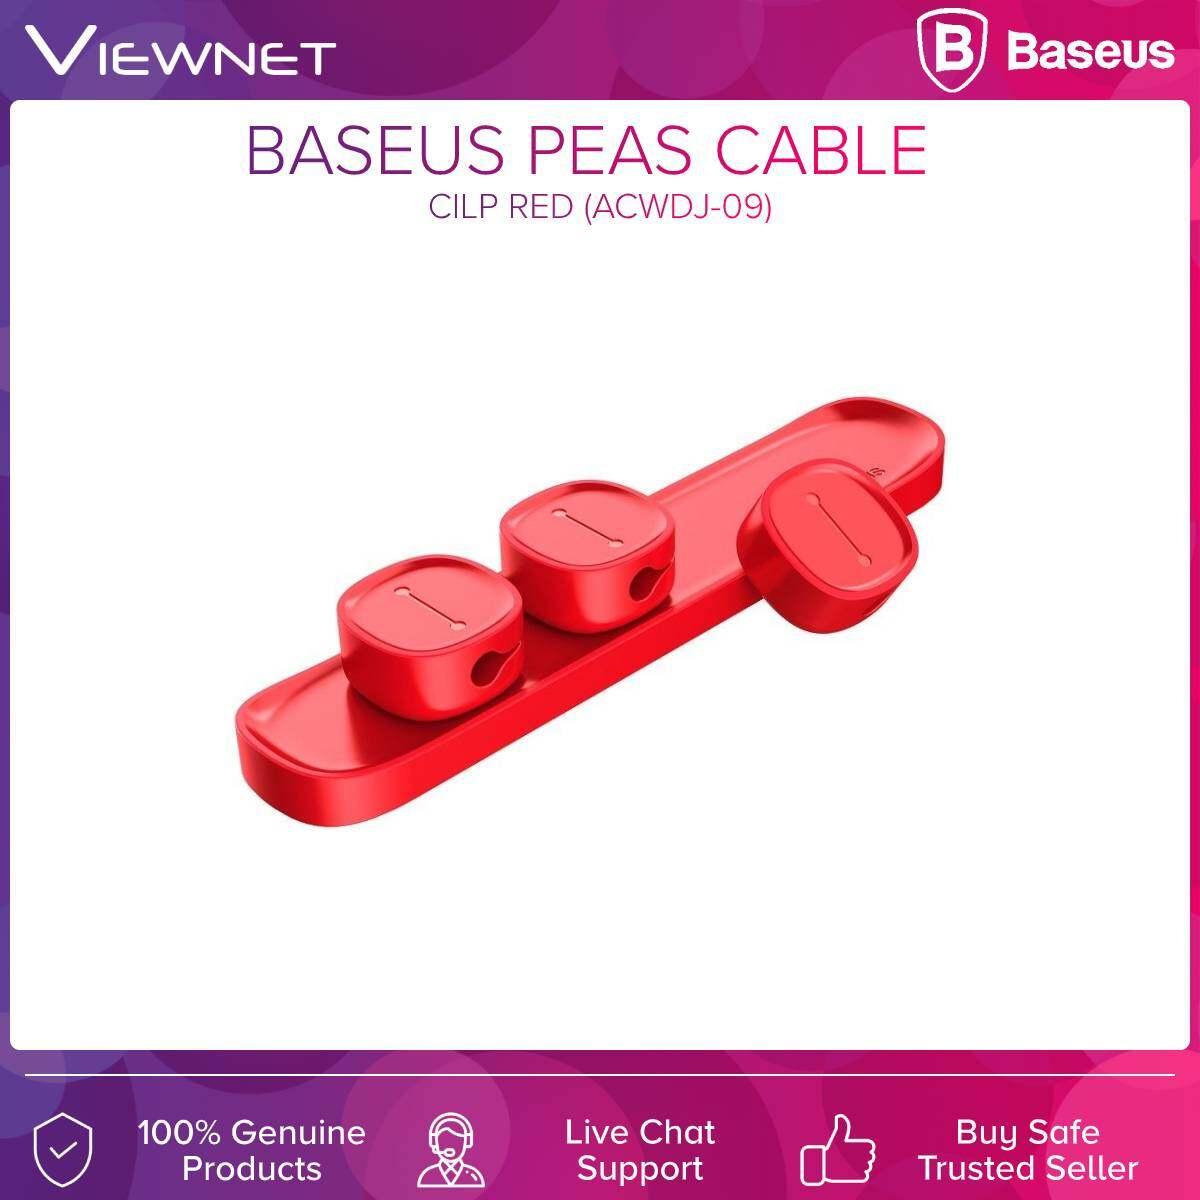 Baseus Peas Cable Clips Tools BLK (ACWDJ-01) , BLUE (ACWDJ-03) , RED (ACWDJ-09)